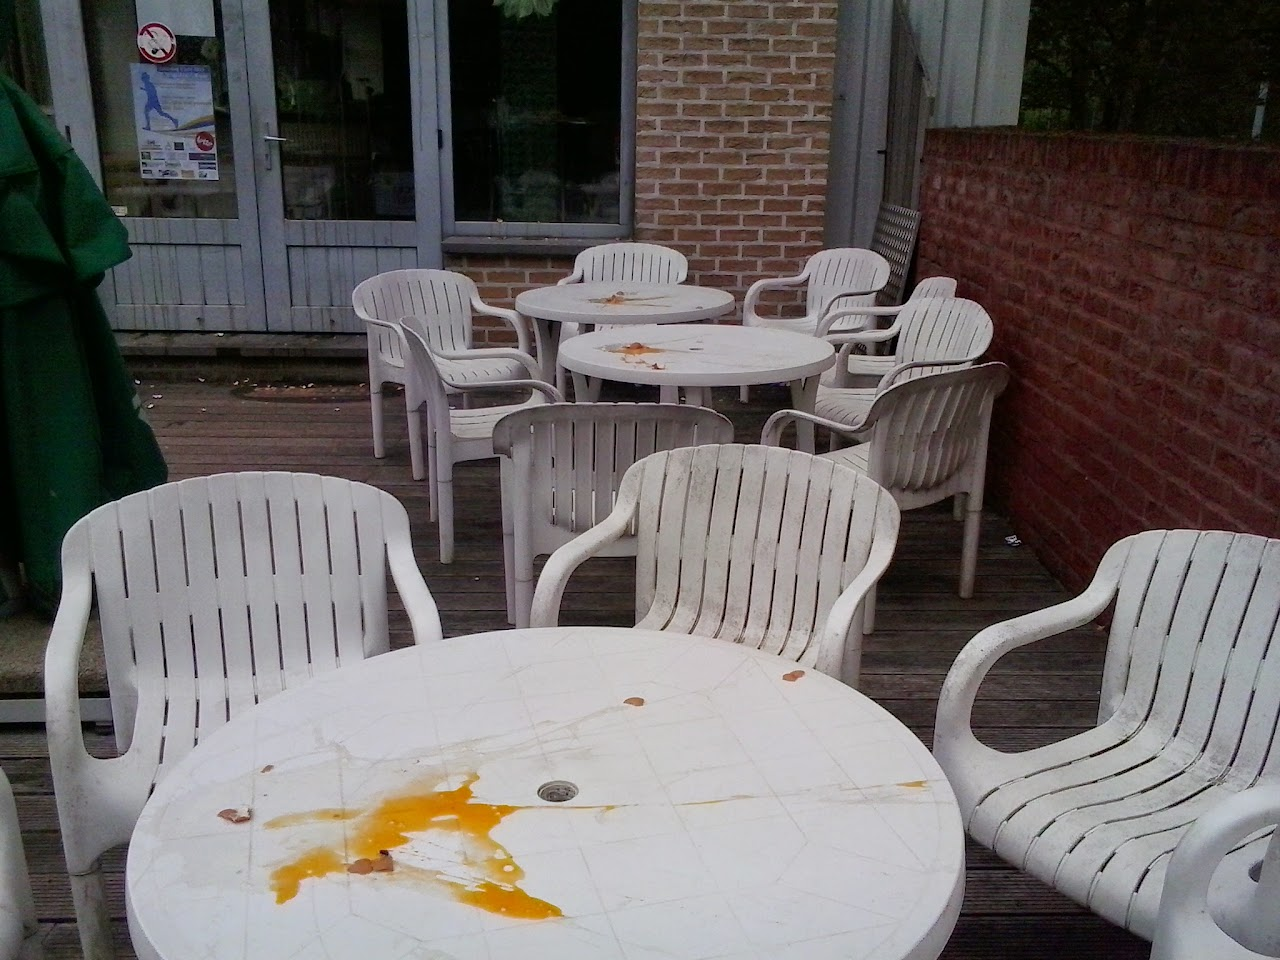 23/05/15 Vandalisme ...